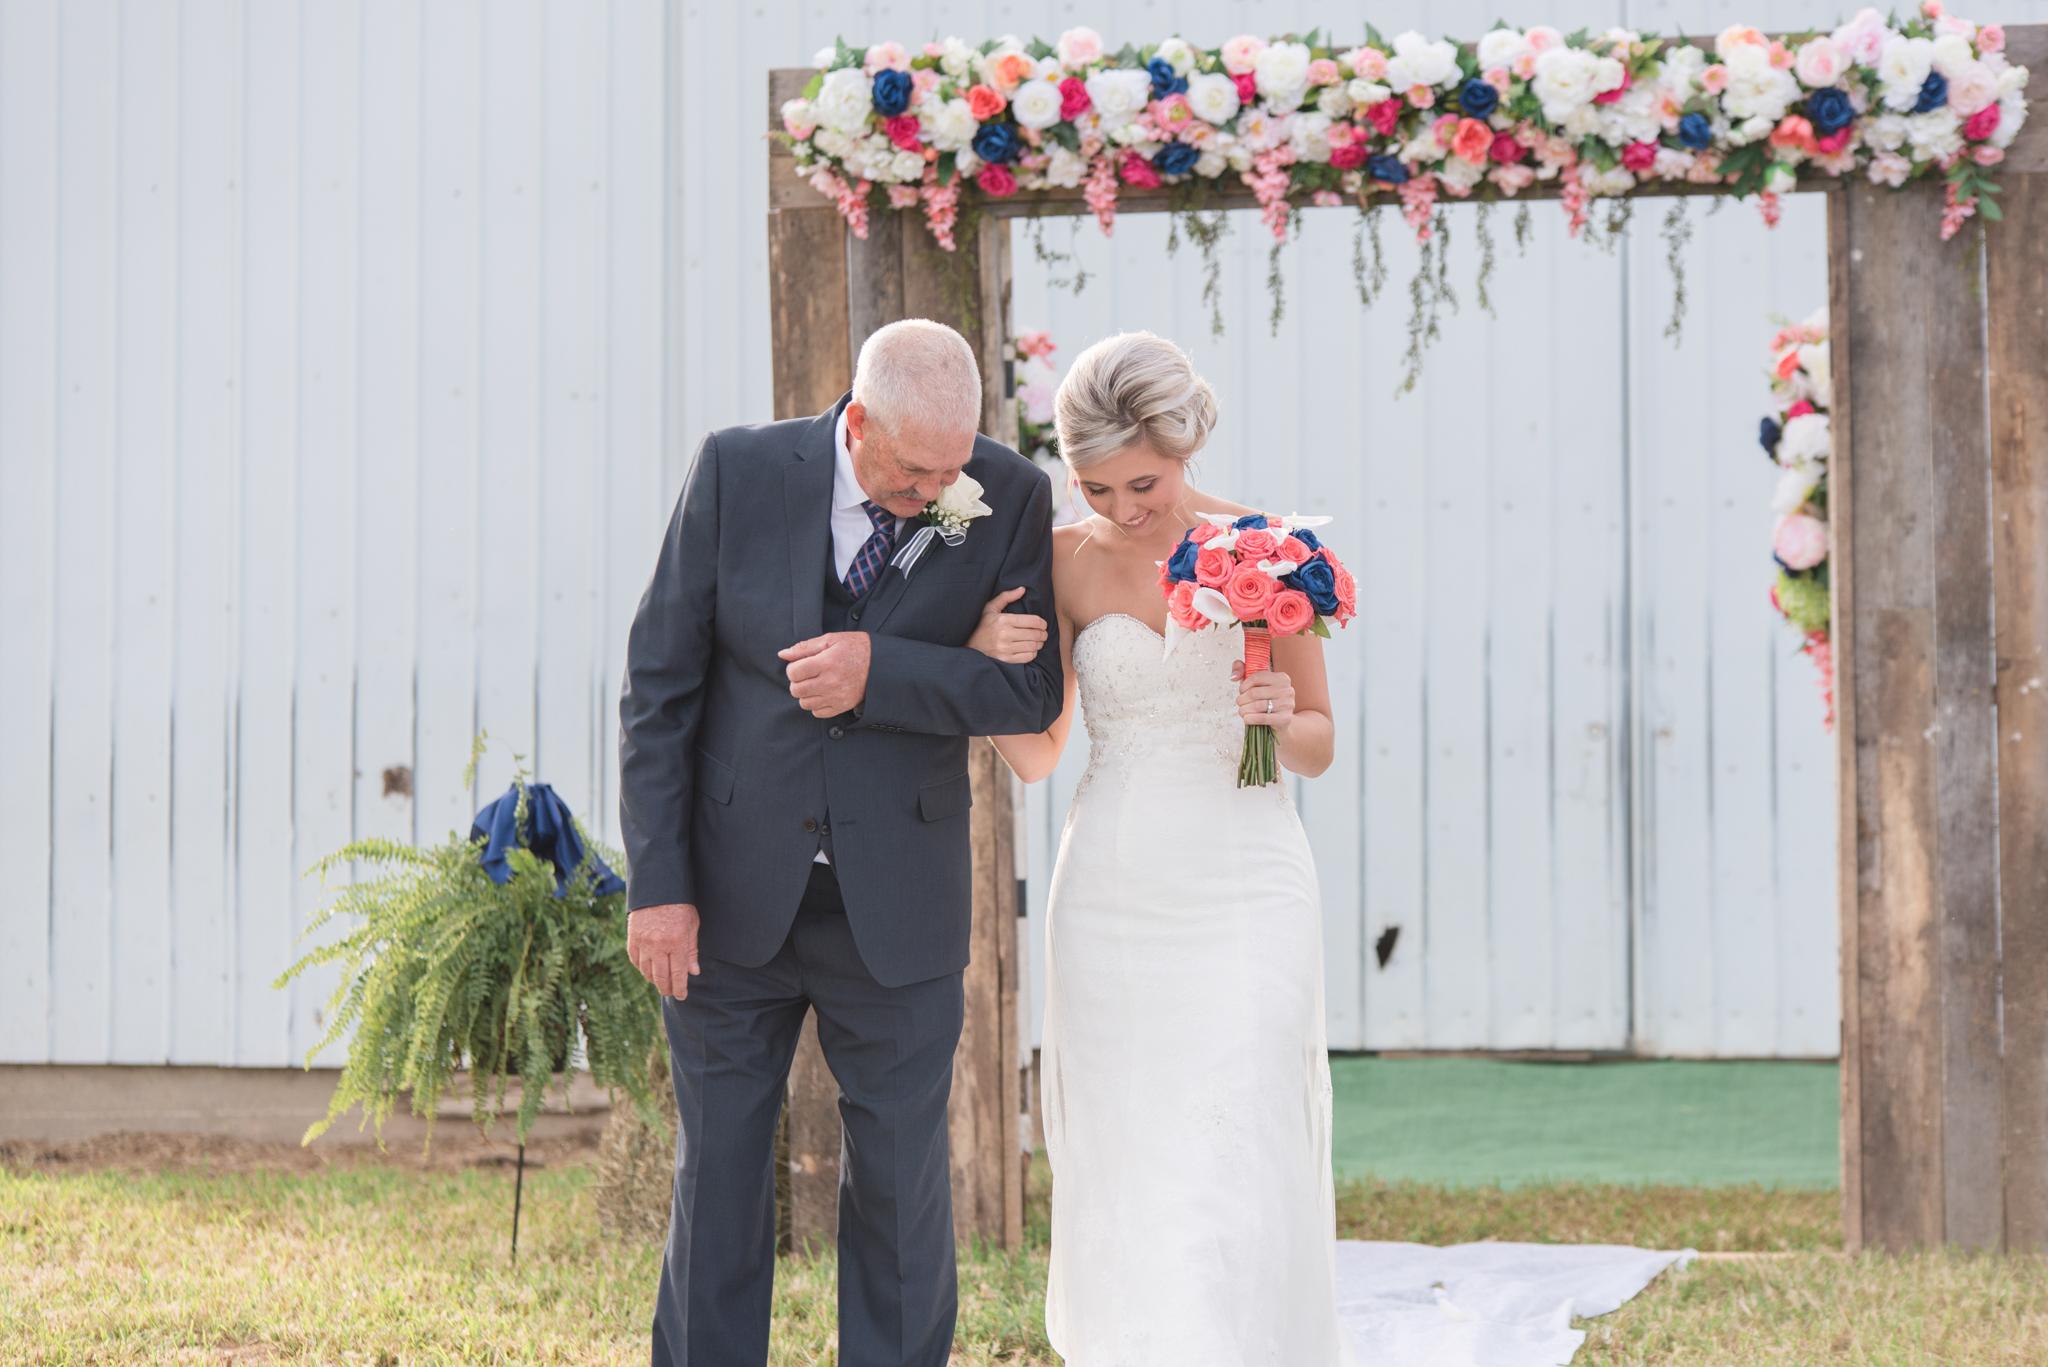 Mt Sterling, Winchester, Lexington, Dry Ridge, Paris, Covington, Kentucky wedding photographer, outdoor wedding, Lexington ky wedding photographers